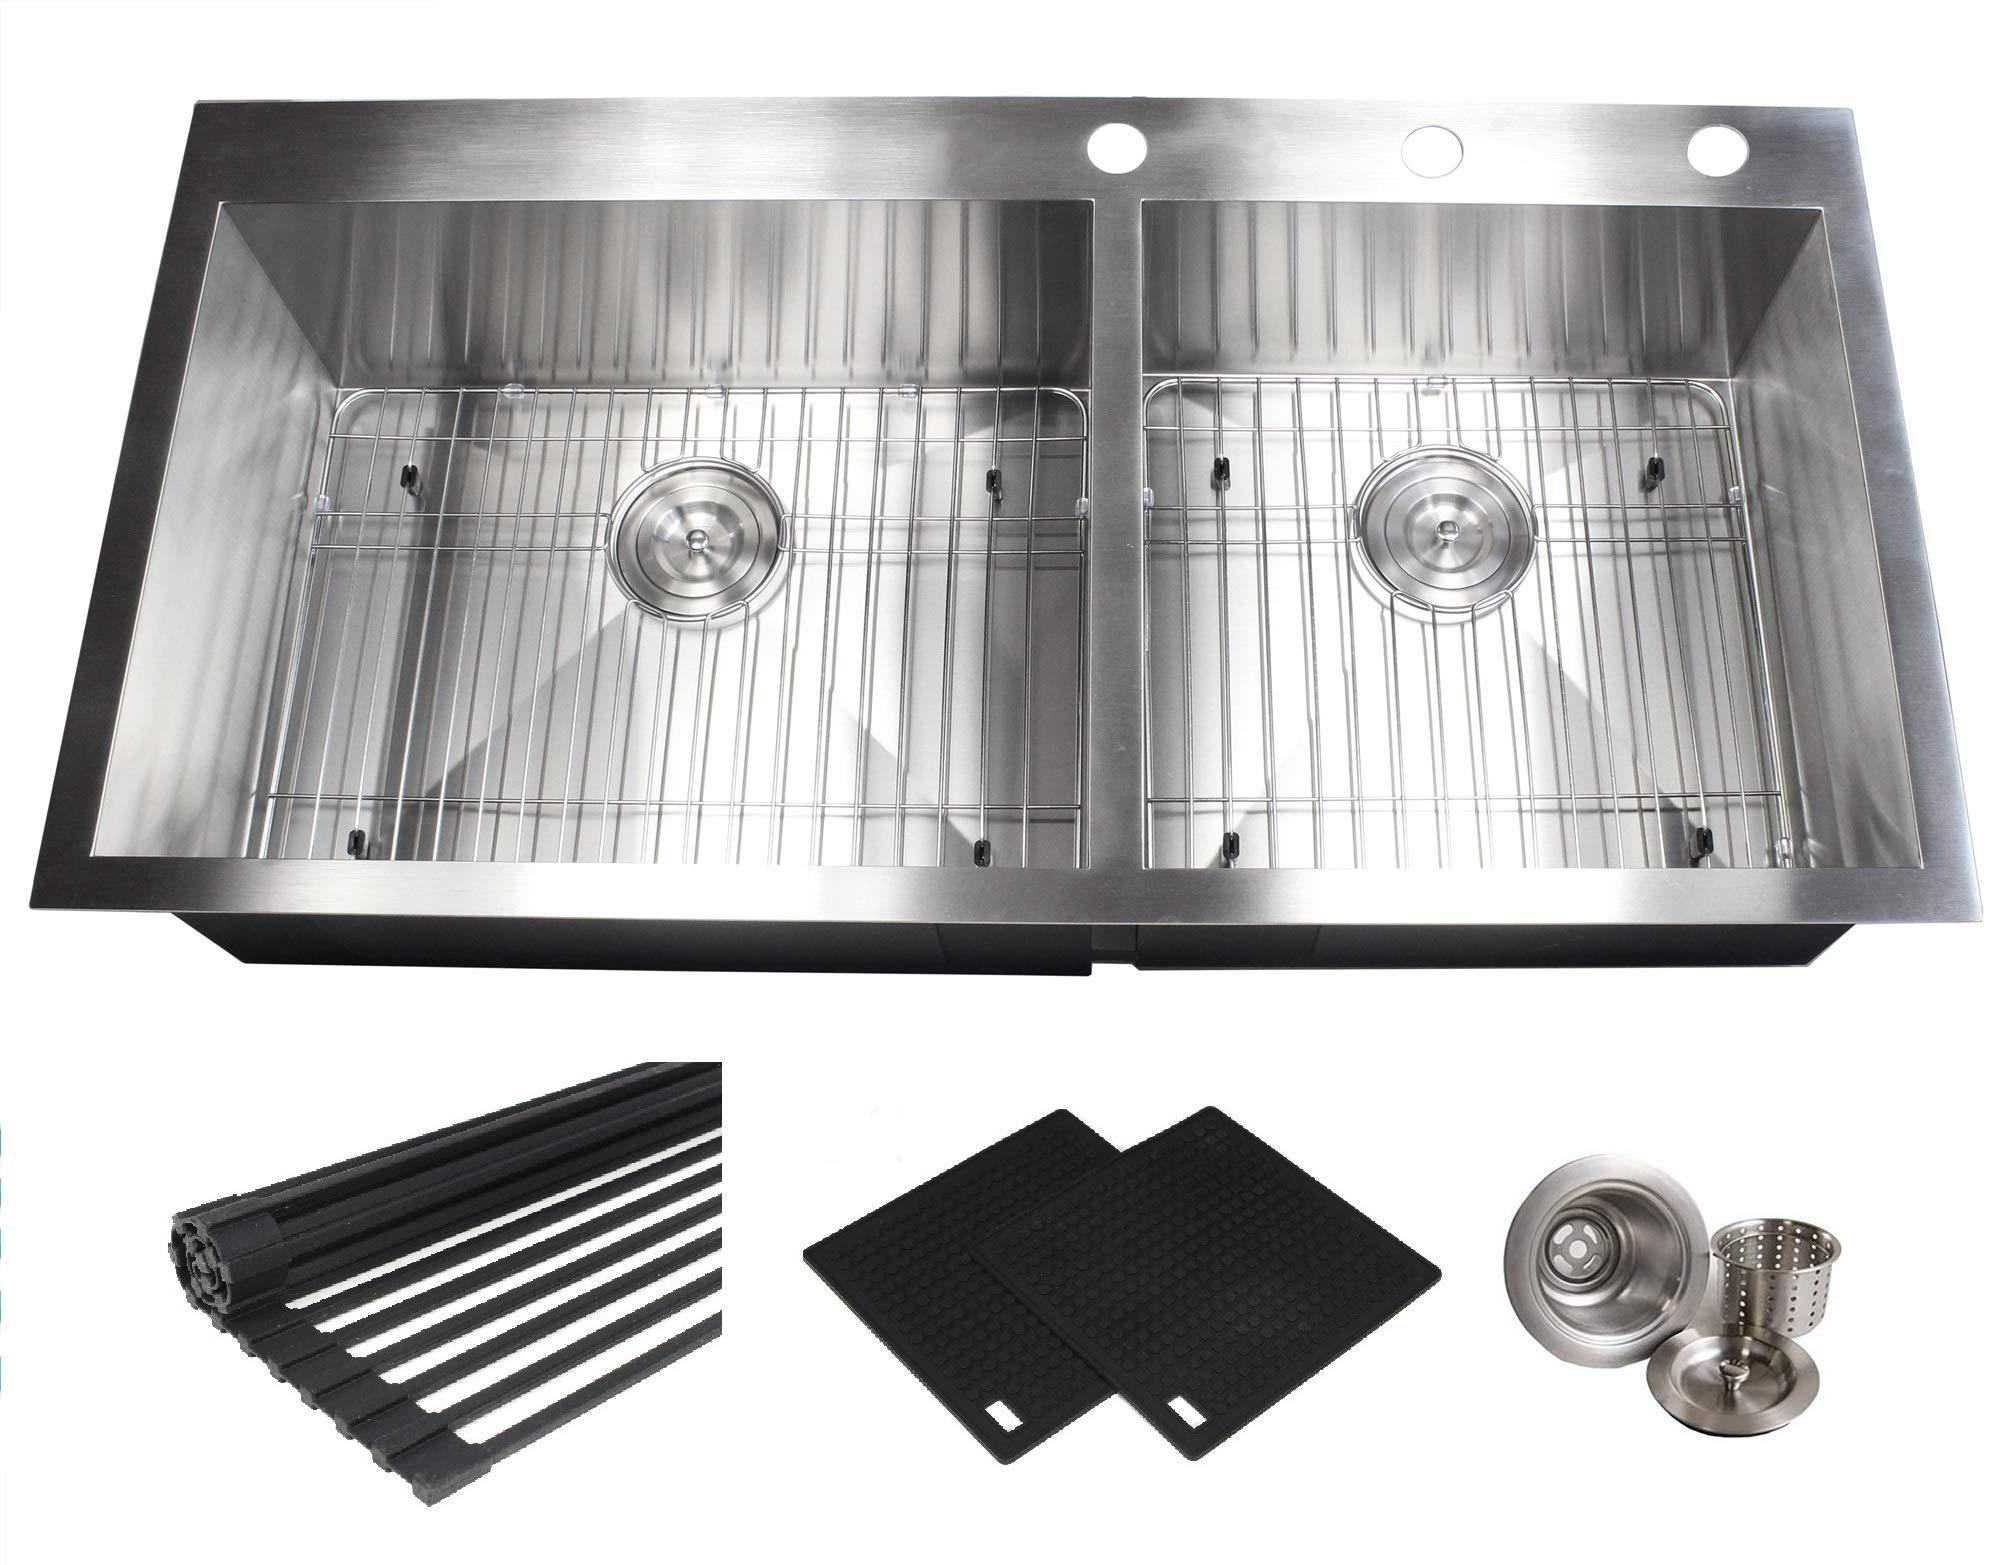 43 INCH (6040) Zero Radius Design 16 Gauge Topmount Drop In Over the Counter Large Double Bowl 5050 Stainless Steel Kitchen Sink Premium Package 43 INCH (6040) KKR-FT4321-6040